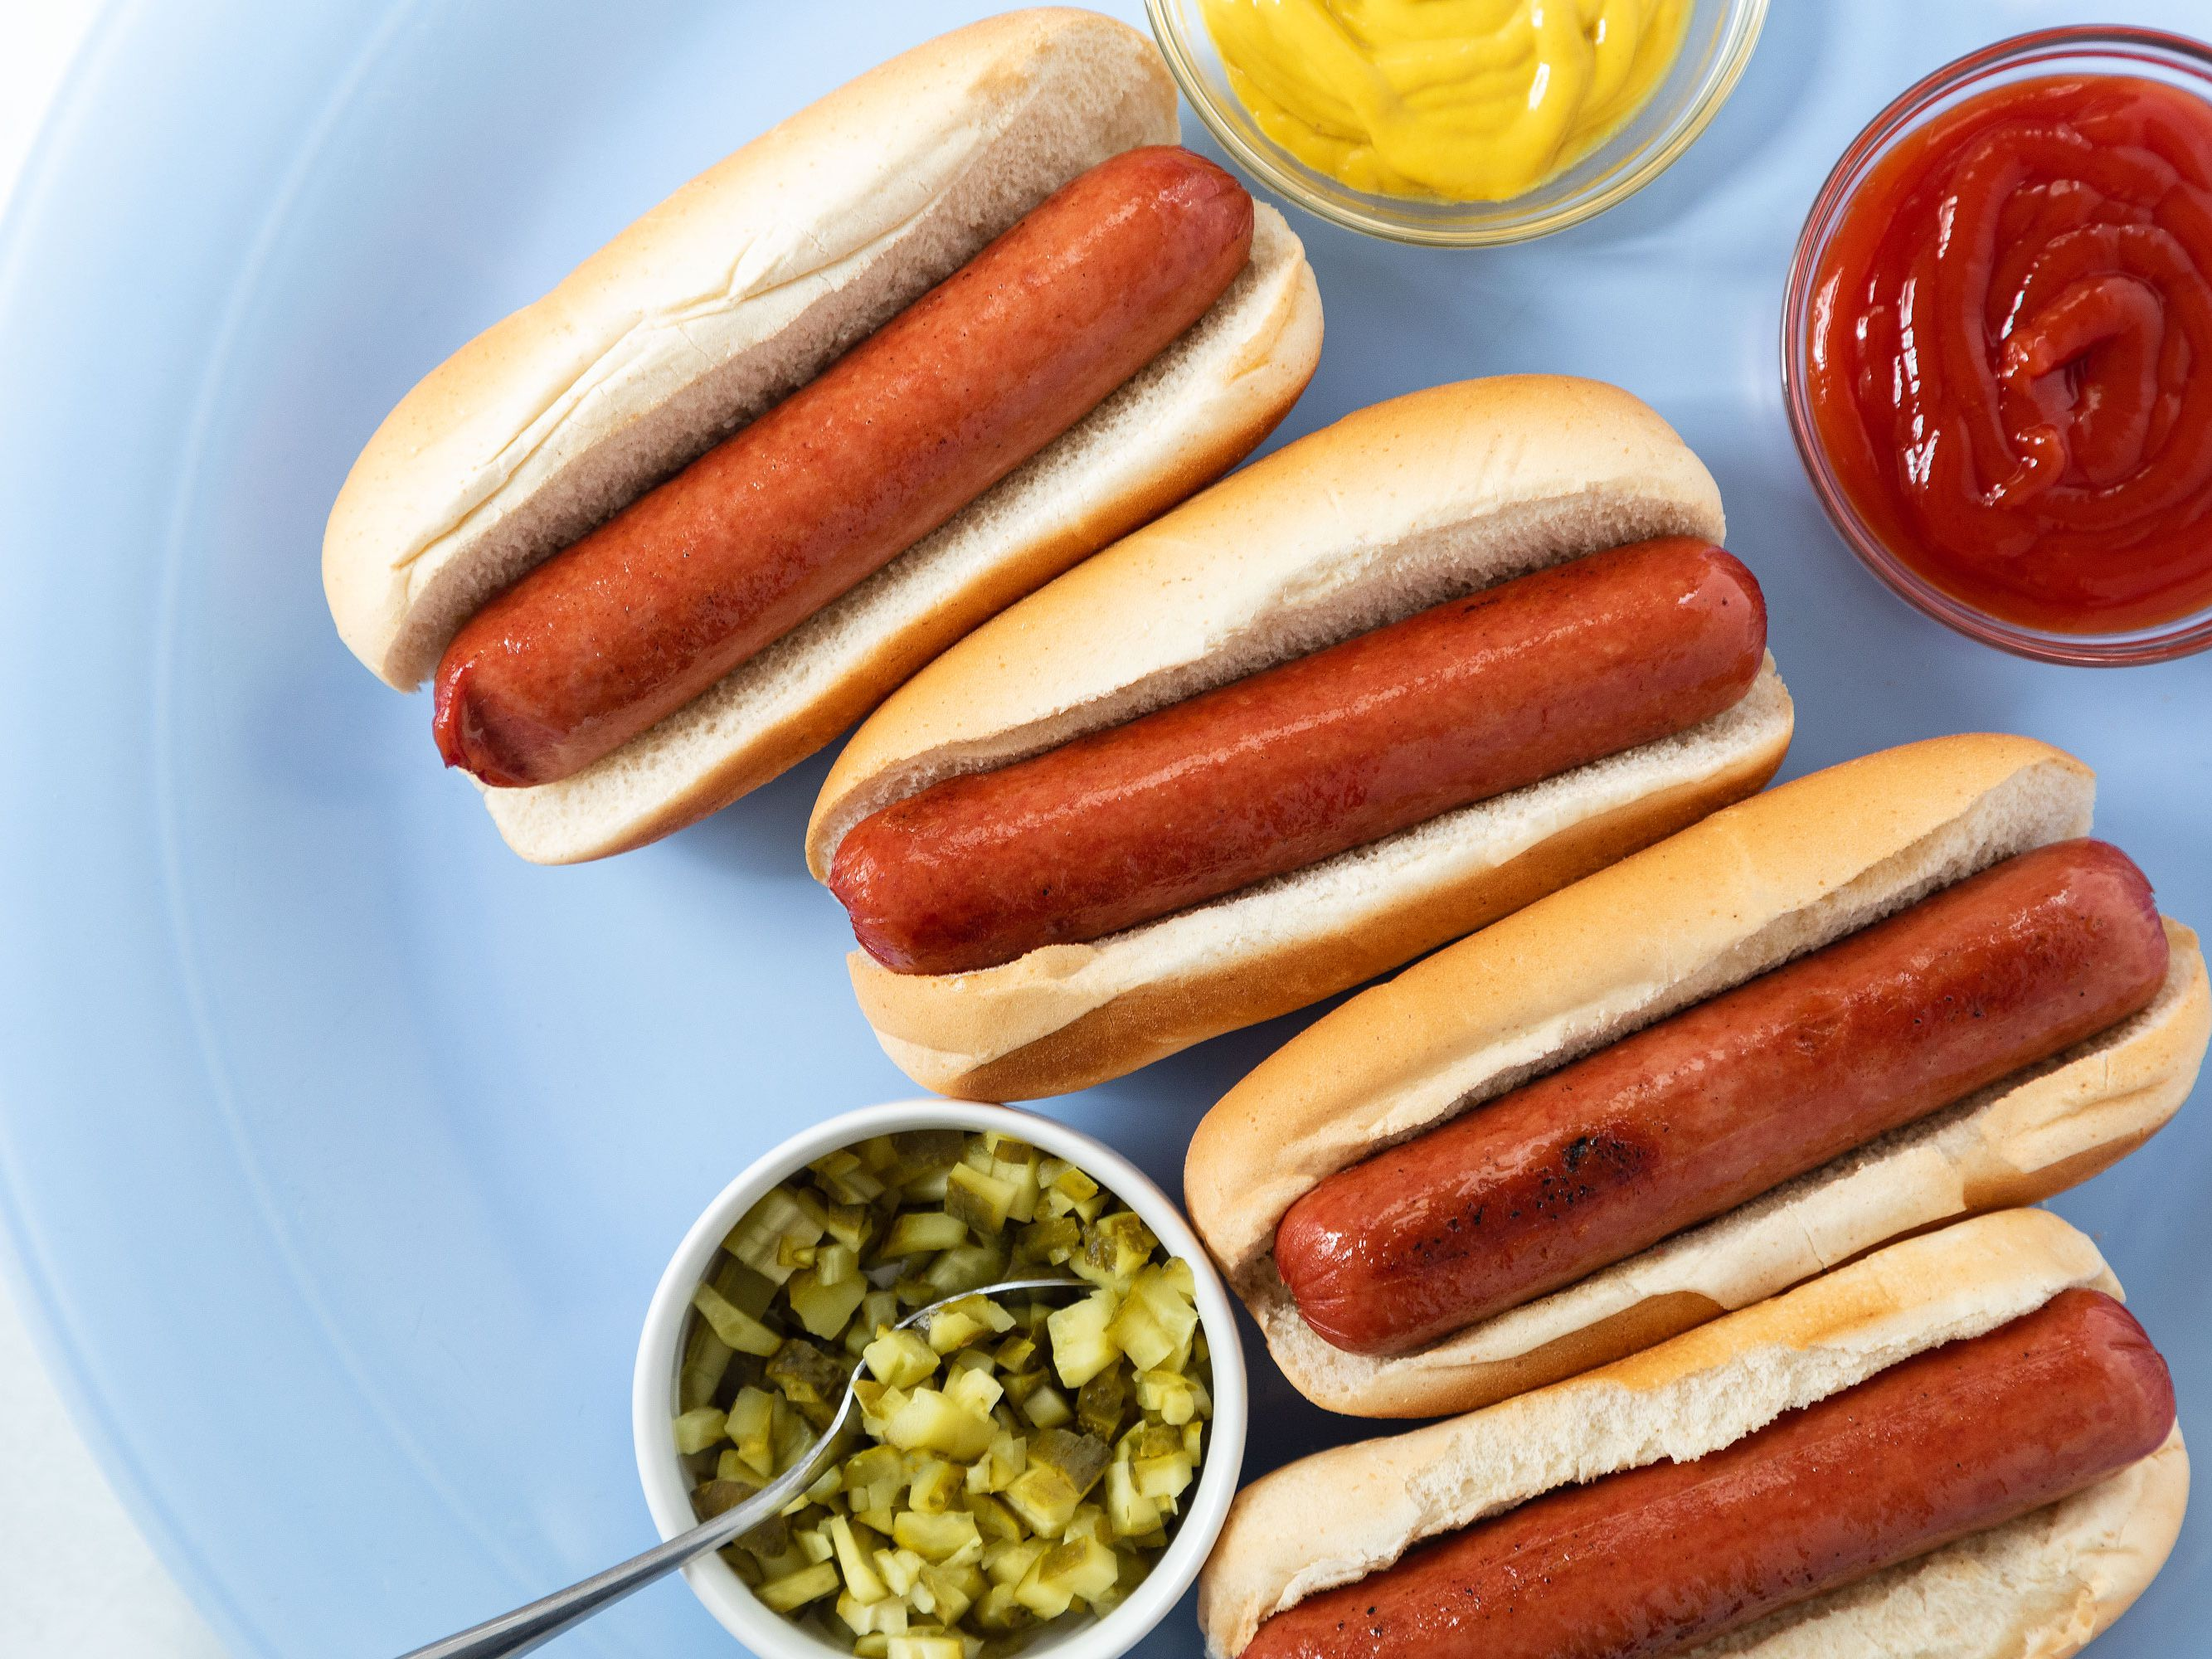 A Recipe to Make Homemade Hot Dogs